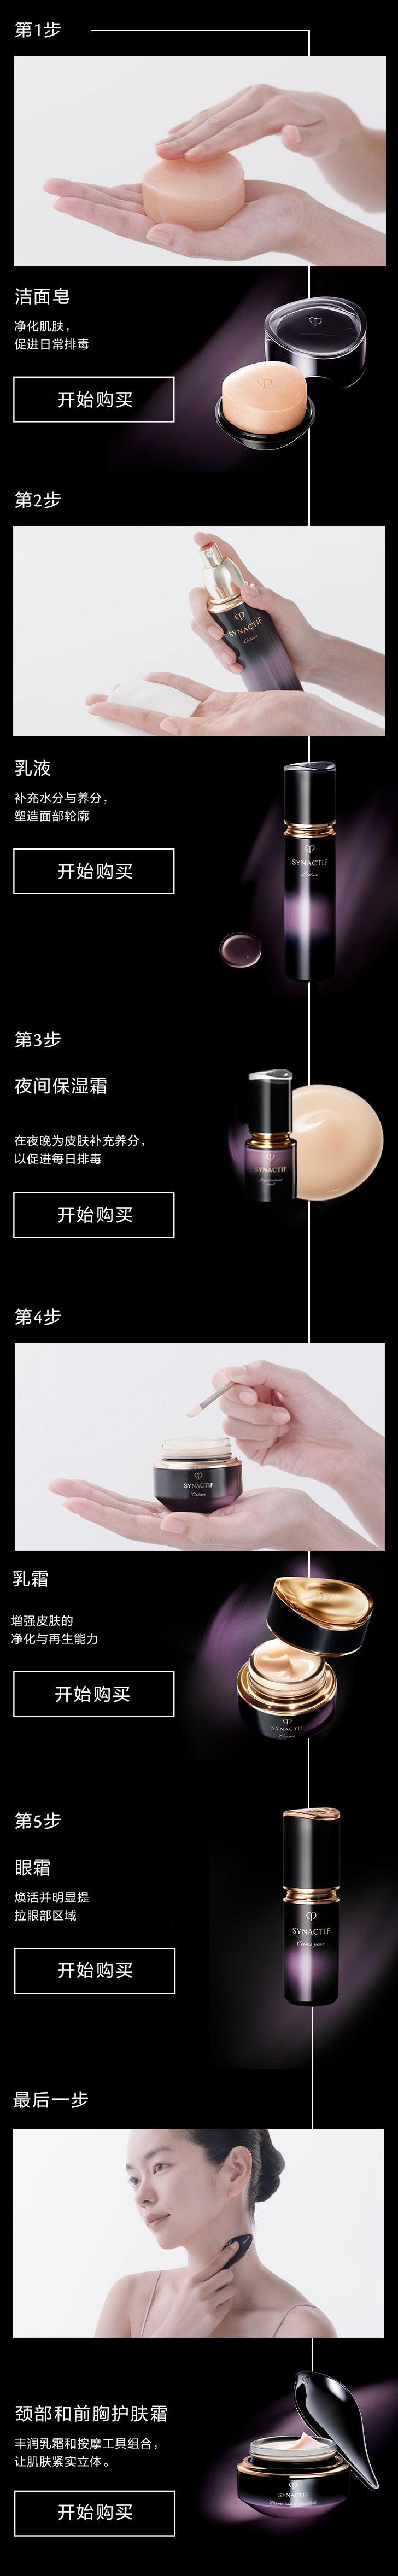 Synactif夜间专属护肤方案产品